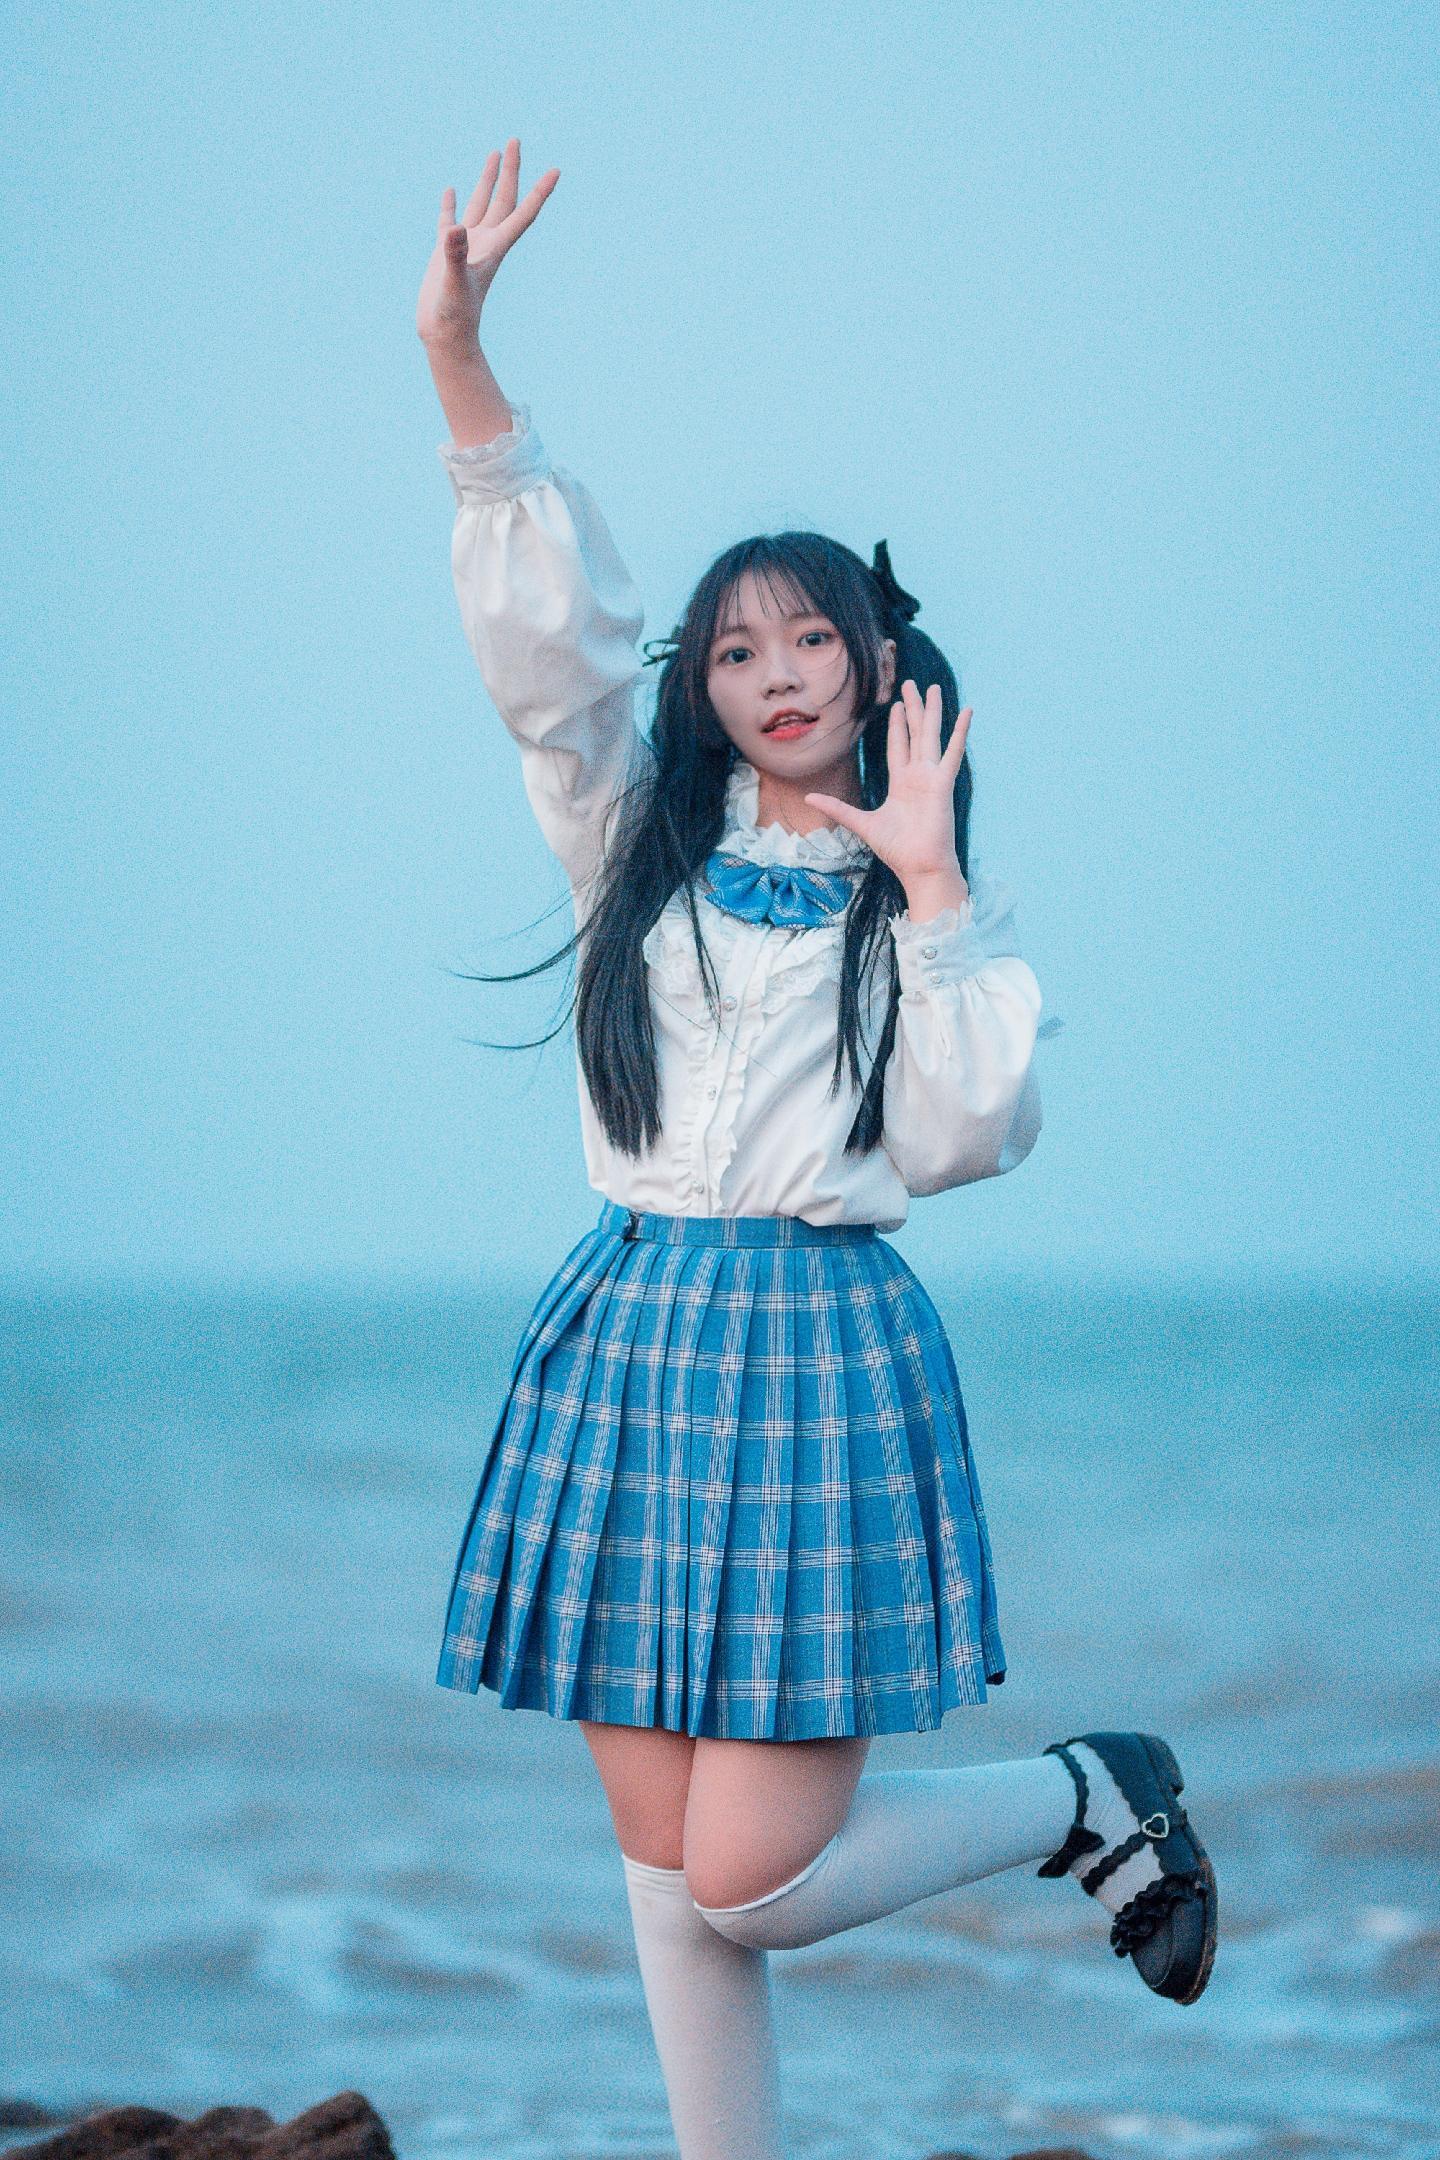 7PGD-713韩国气质美女修身长裙显曼妙身材